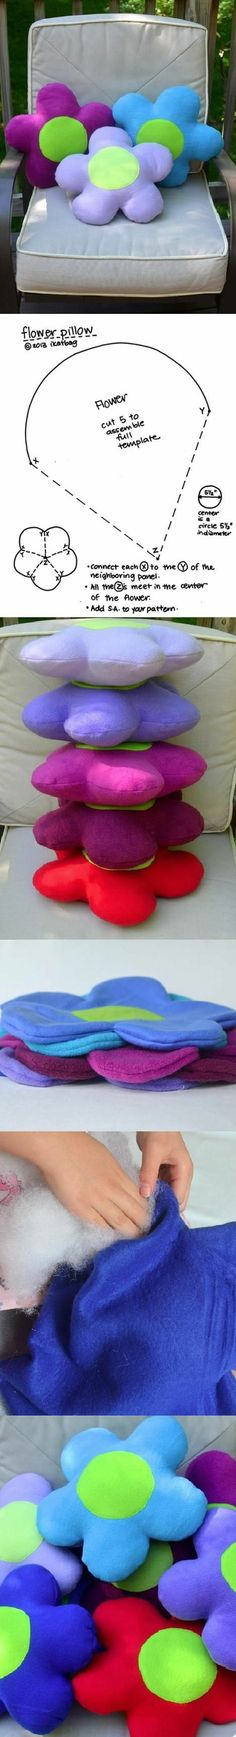 DIY Flower Pillow DIY